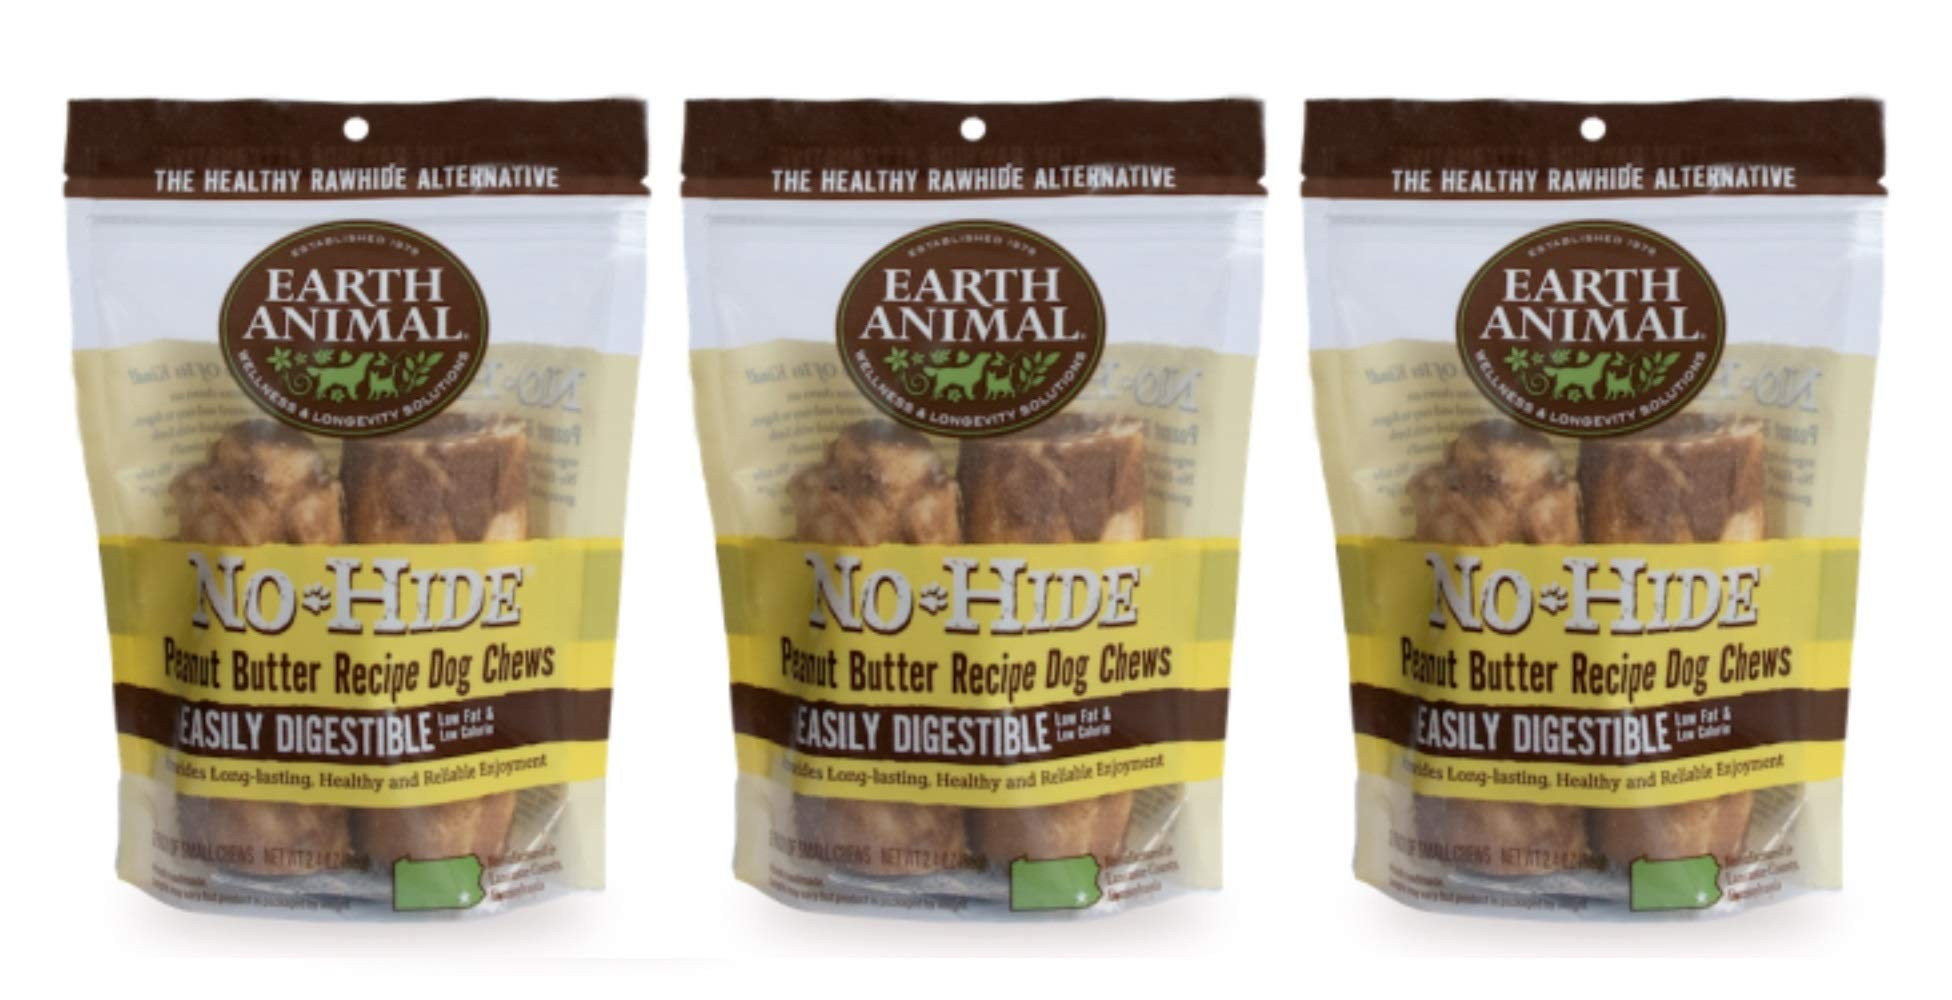 Earth Animal 6 Pack of No-Hide Peanut Butter Dog Chews, Medium, Vegetarian Rawhide Alternative by Earth Animal